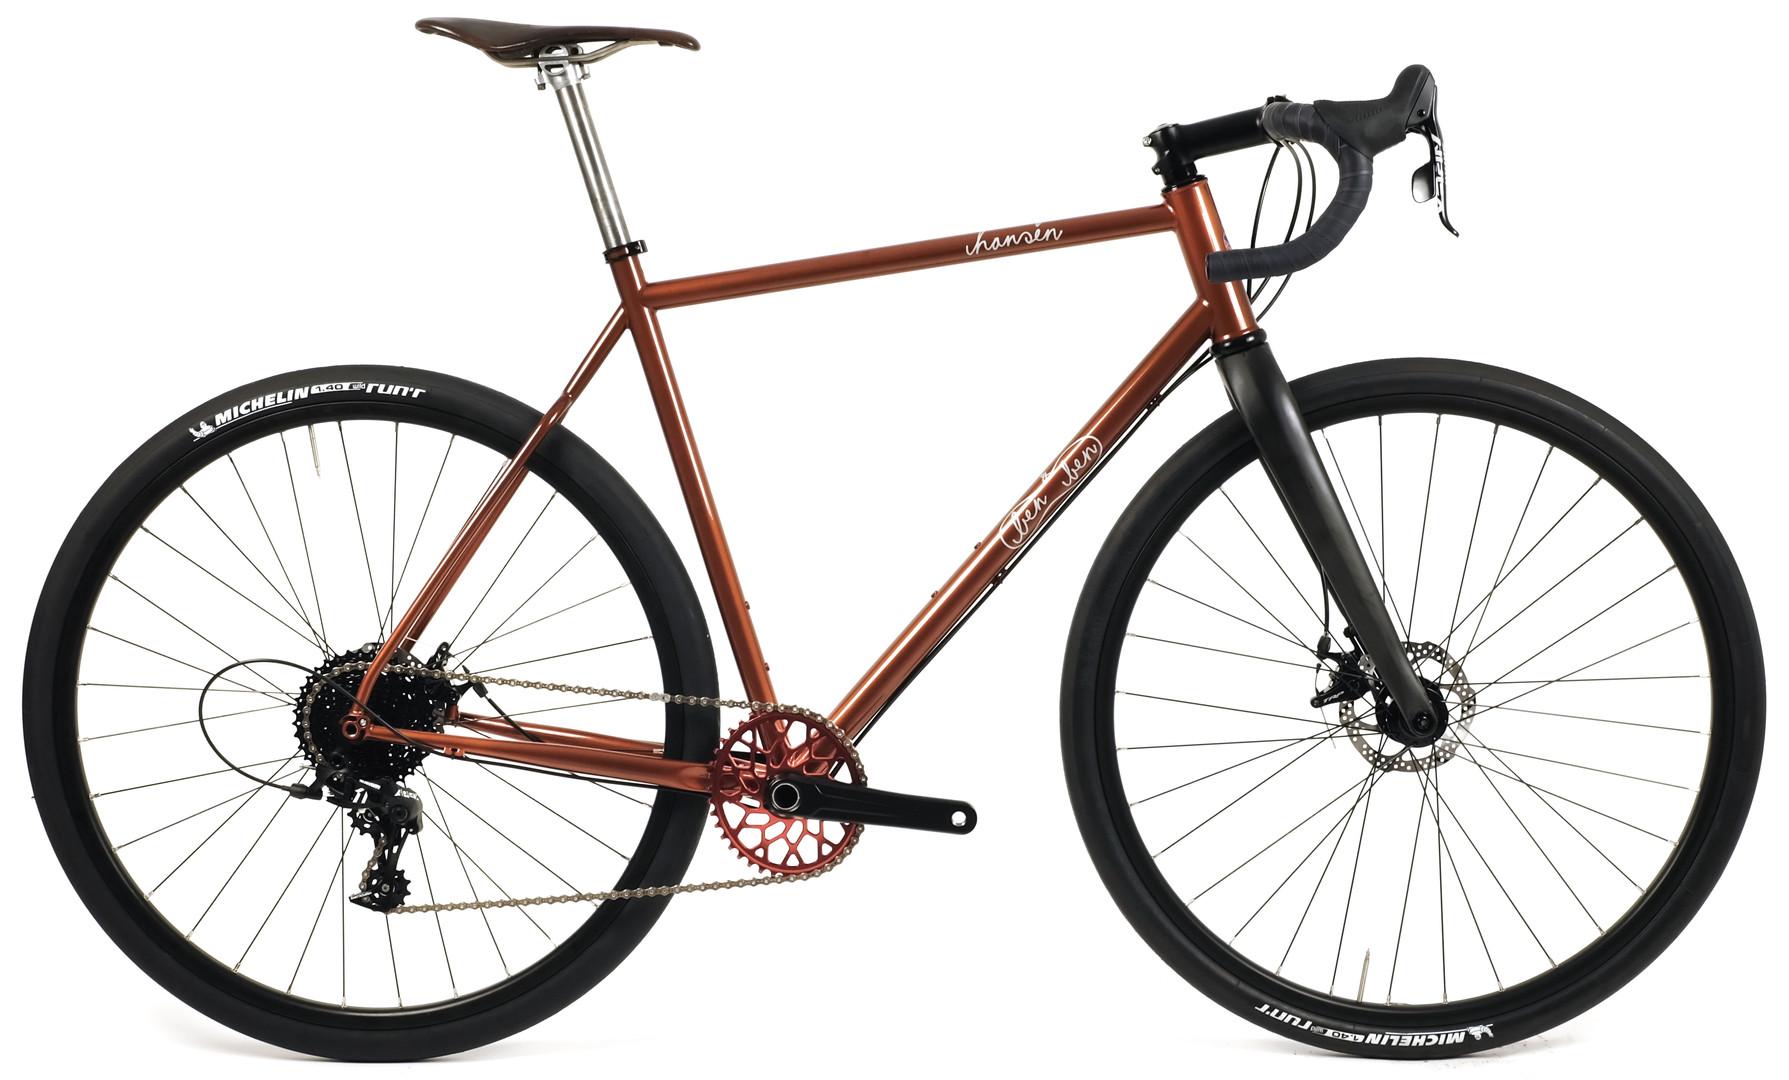 Benben_Hansen 57 full bike strawberry.jp